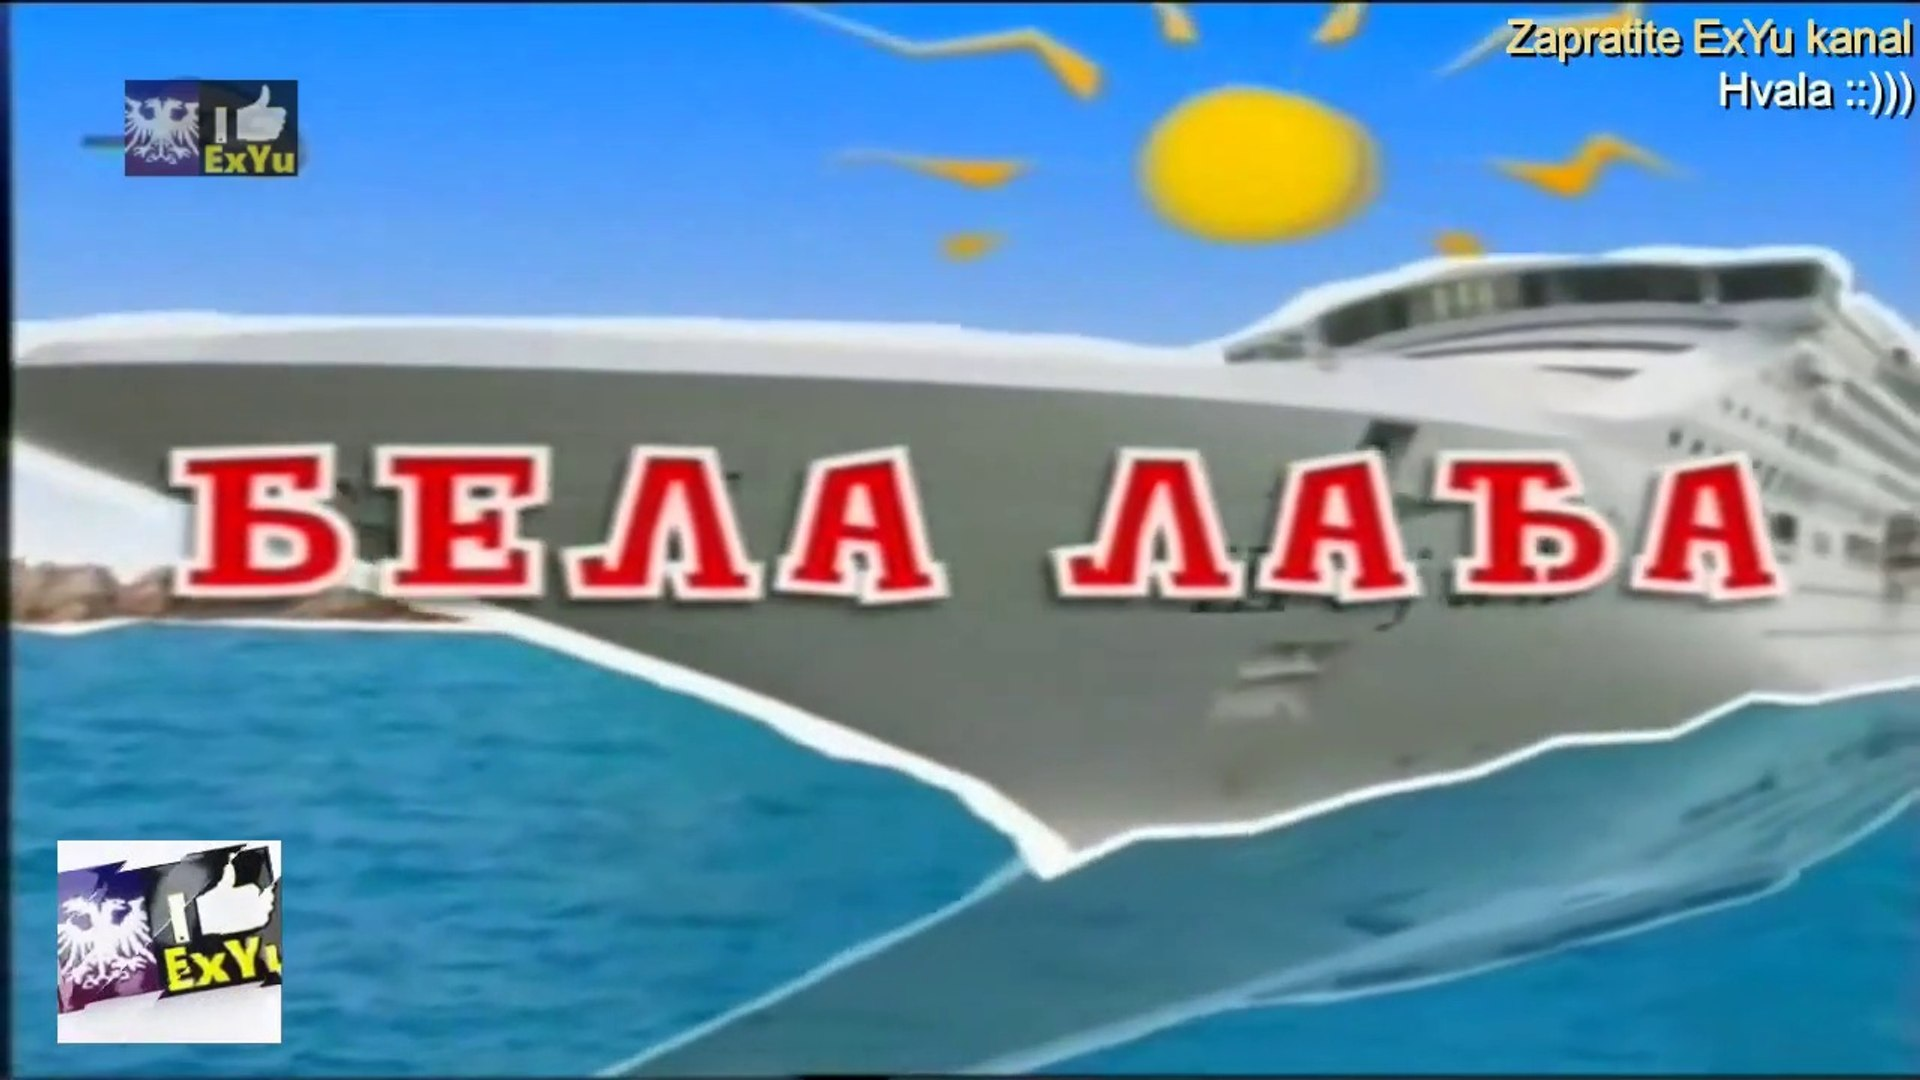 Bela Ladja 6 epizoda | Šojić humoristička serija